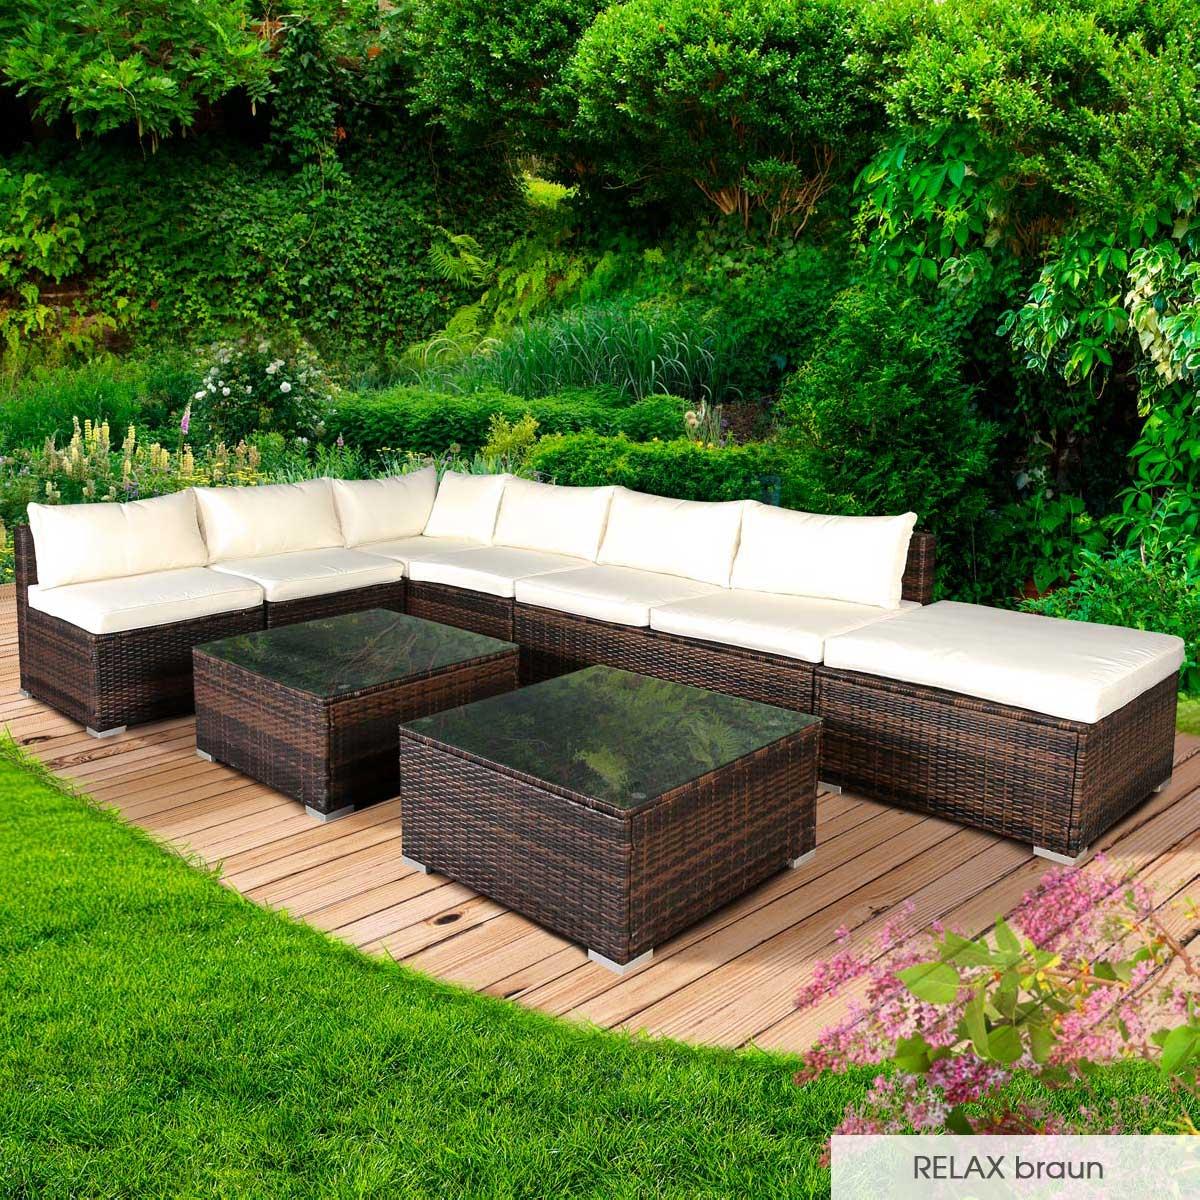 Gartenmoebel-Poly-Rattan-Lounge-Moebel-Sitzgarnitur-Gartengarnitur-Sitzgruppe-Sofa Indexbild 29